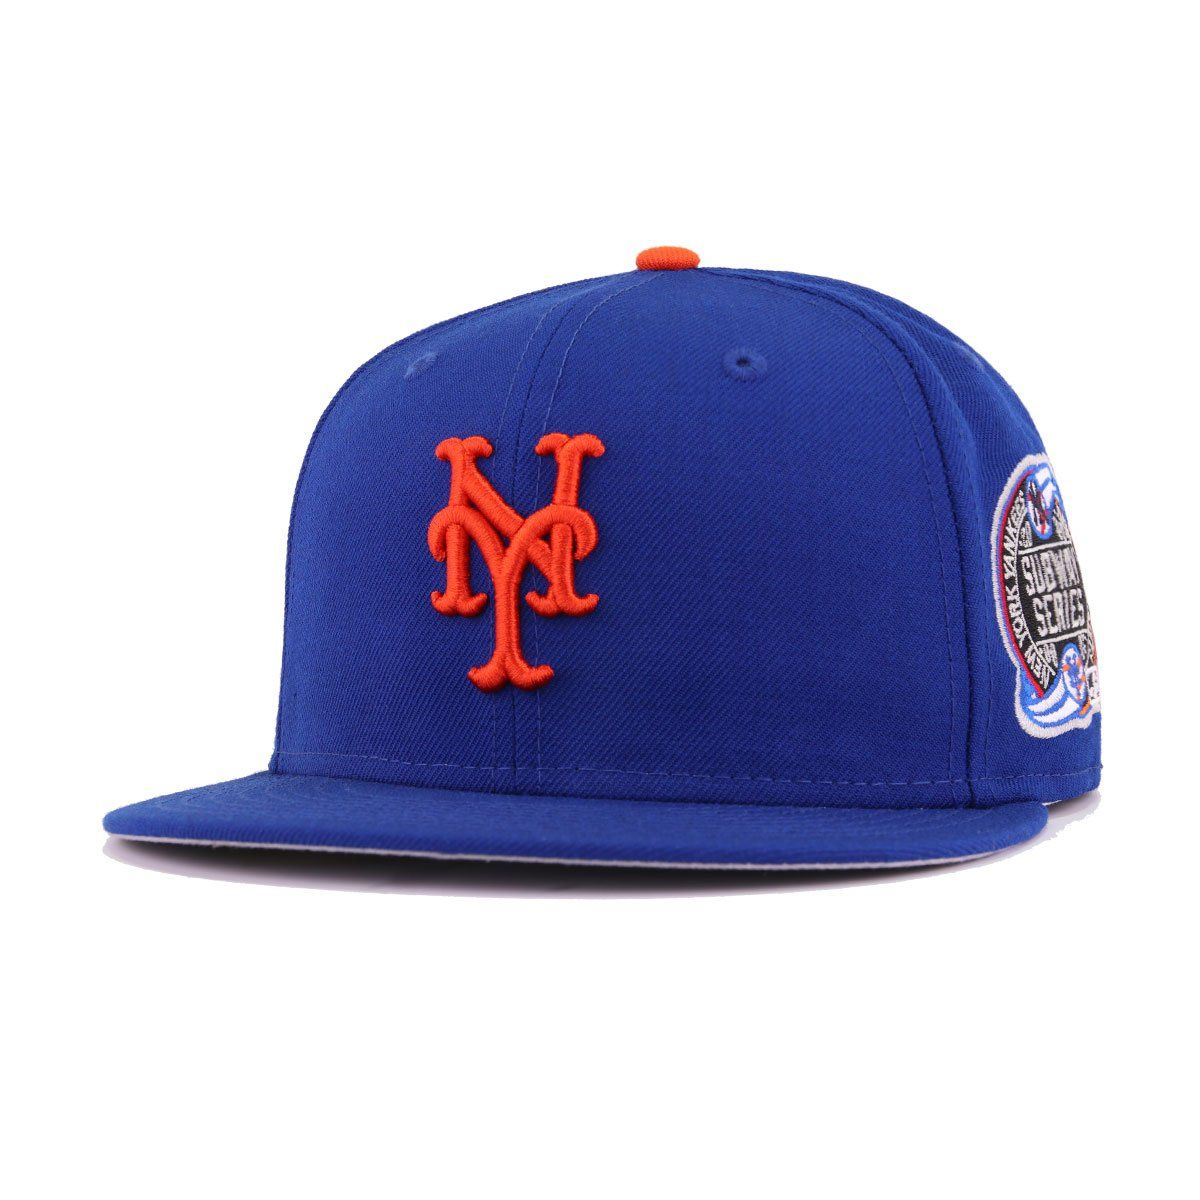 New York Mets Light Royal Blue Orangeade Subway Series